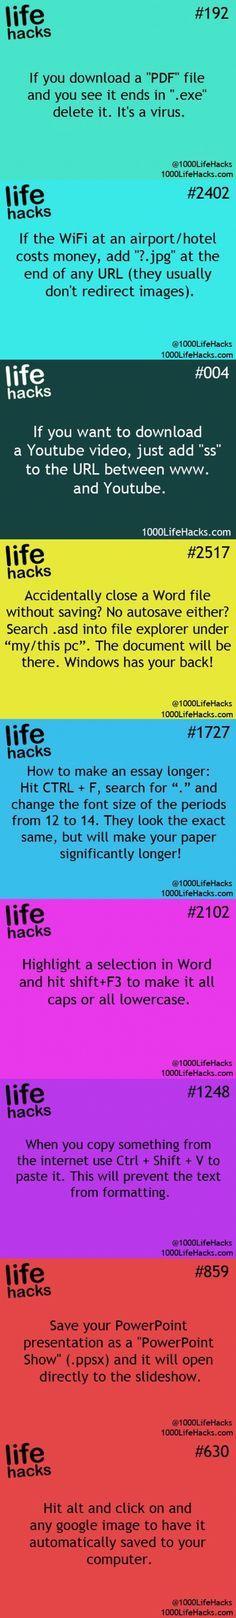 Life hacks 1000